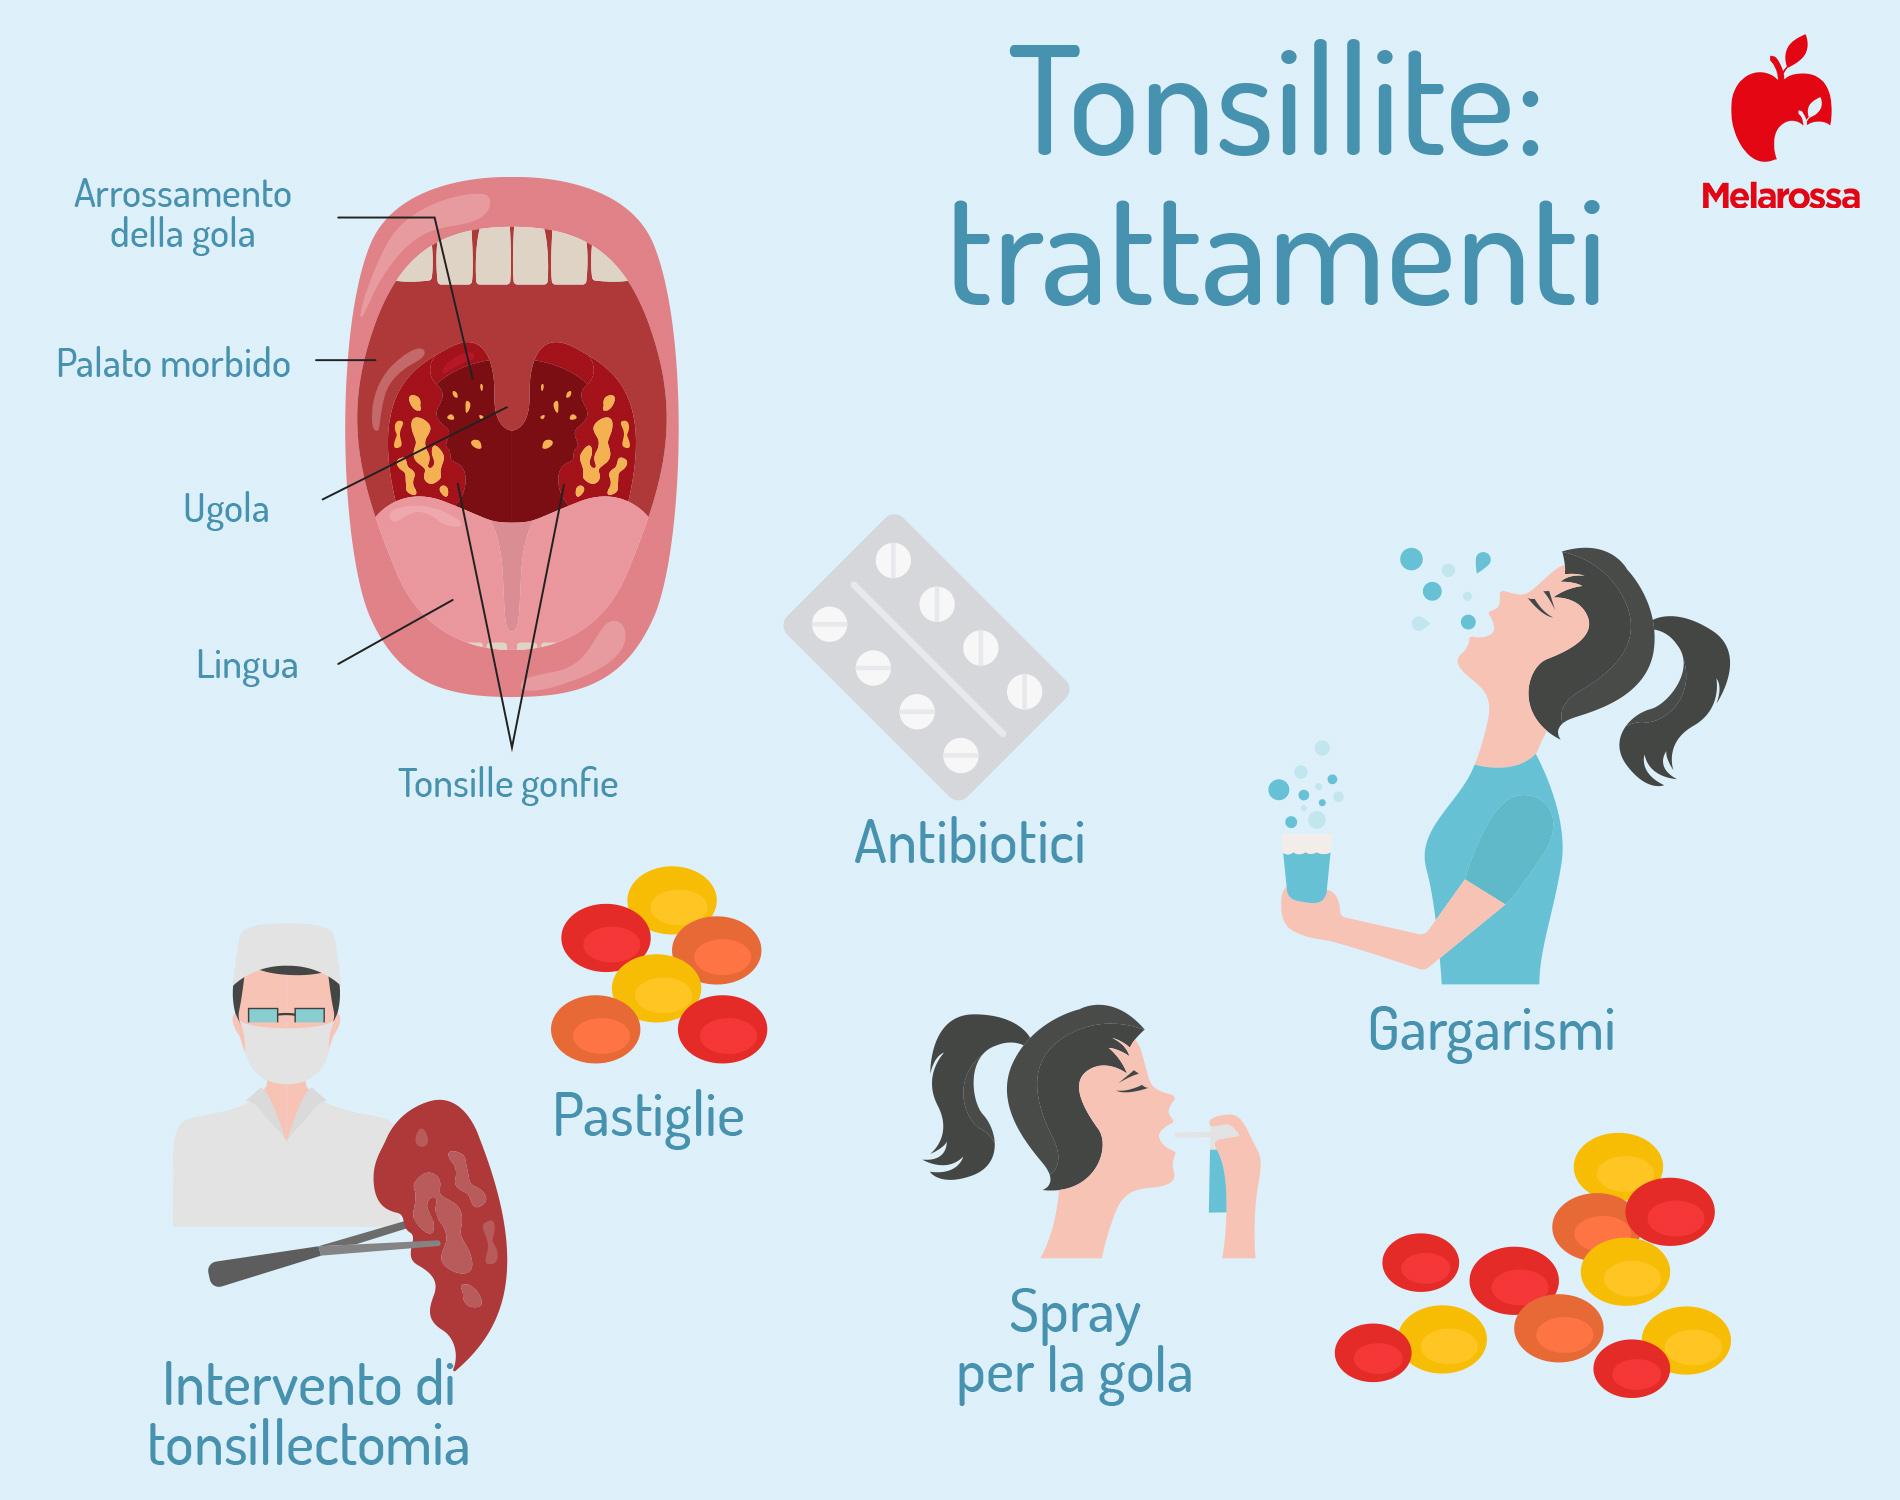 tonsillite: trattamenti